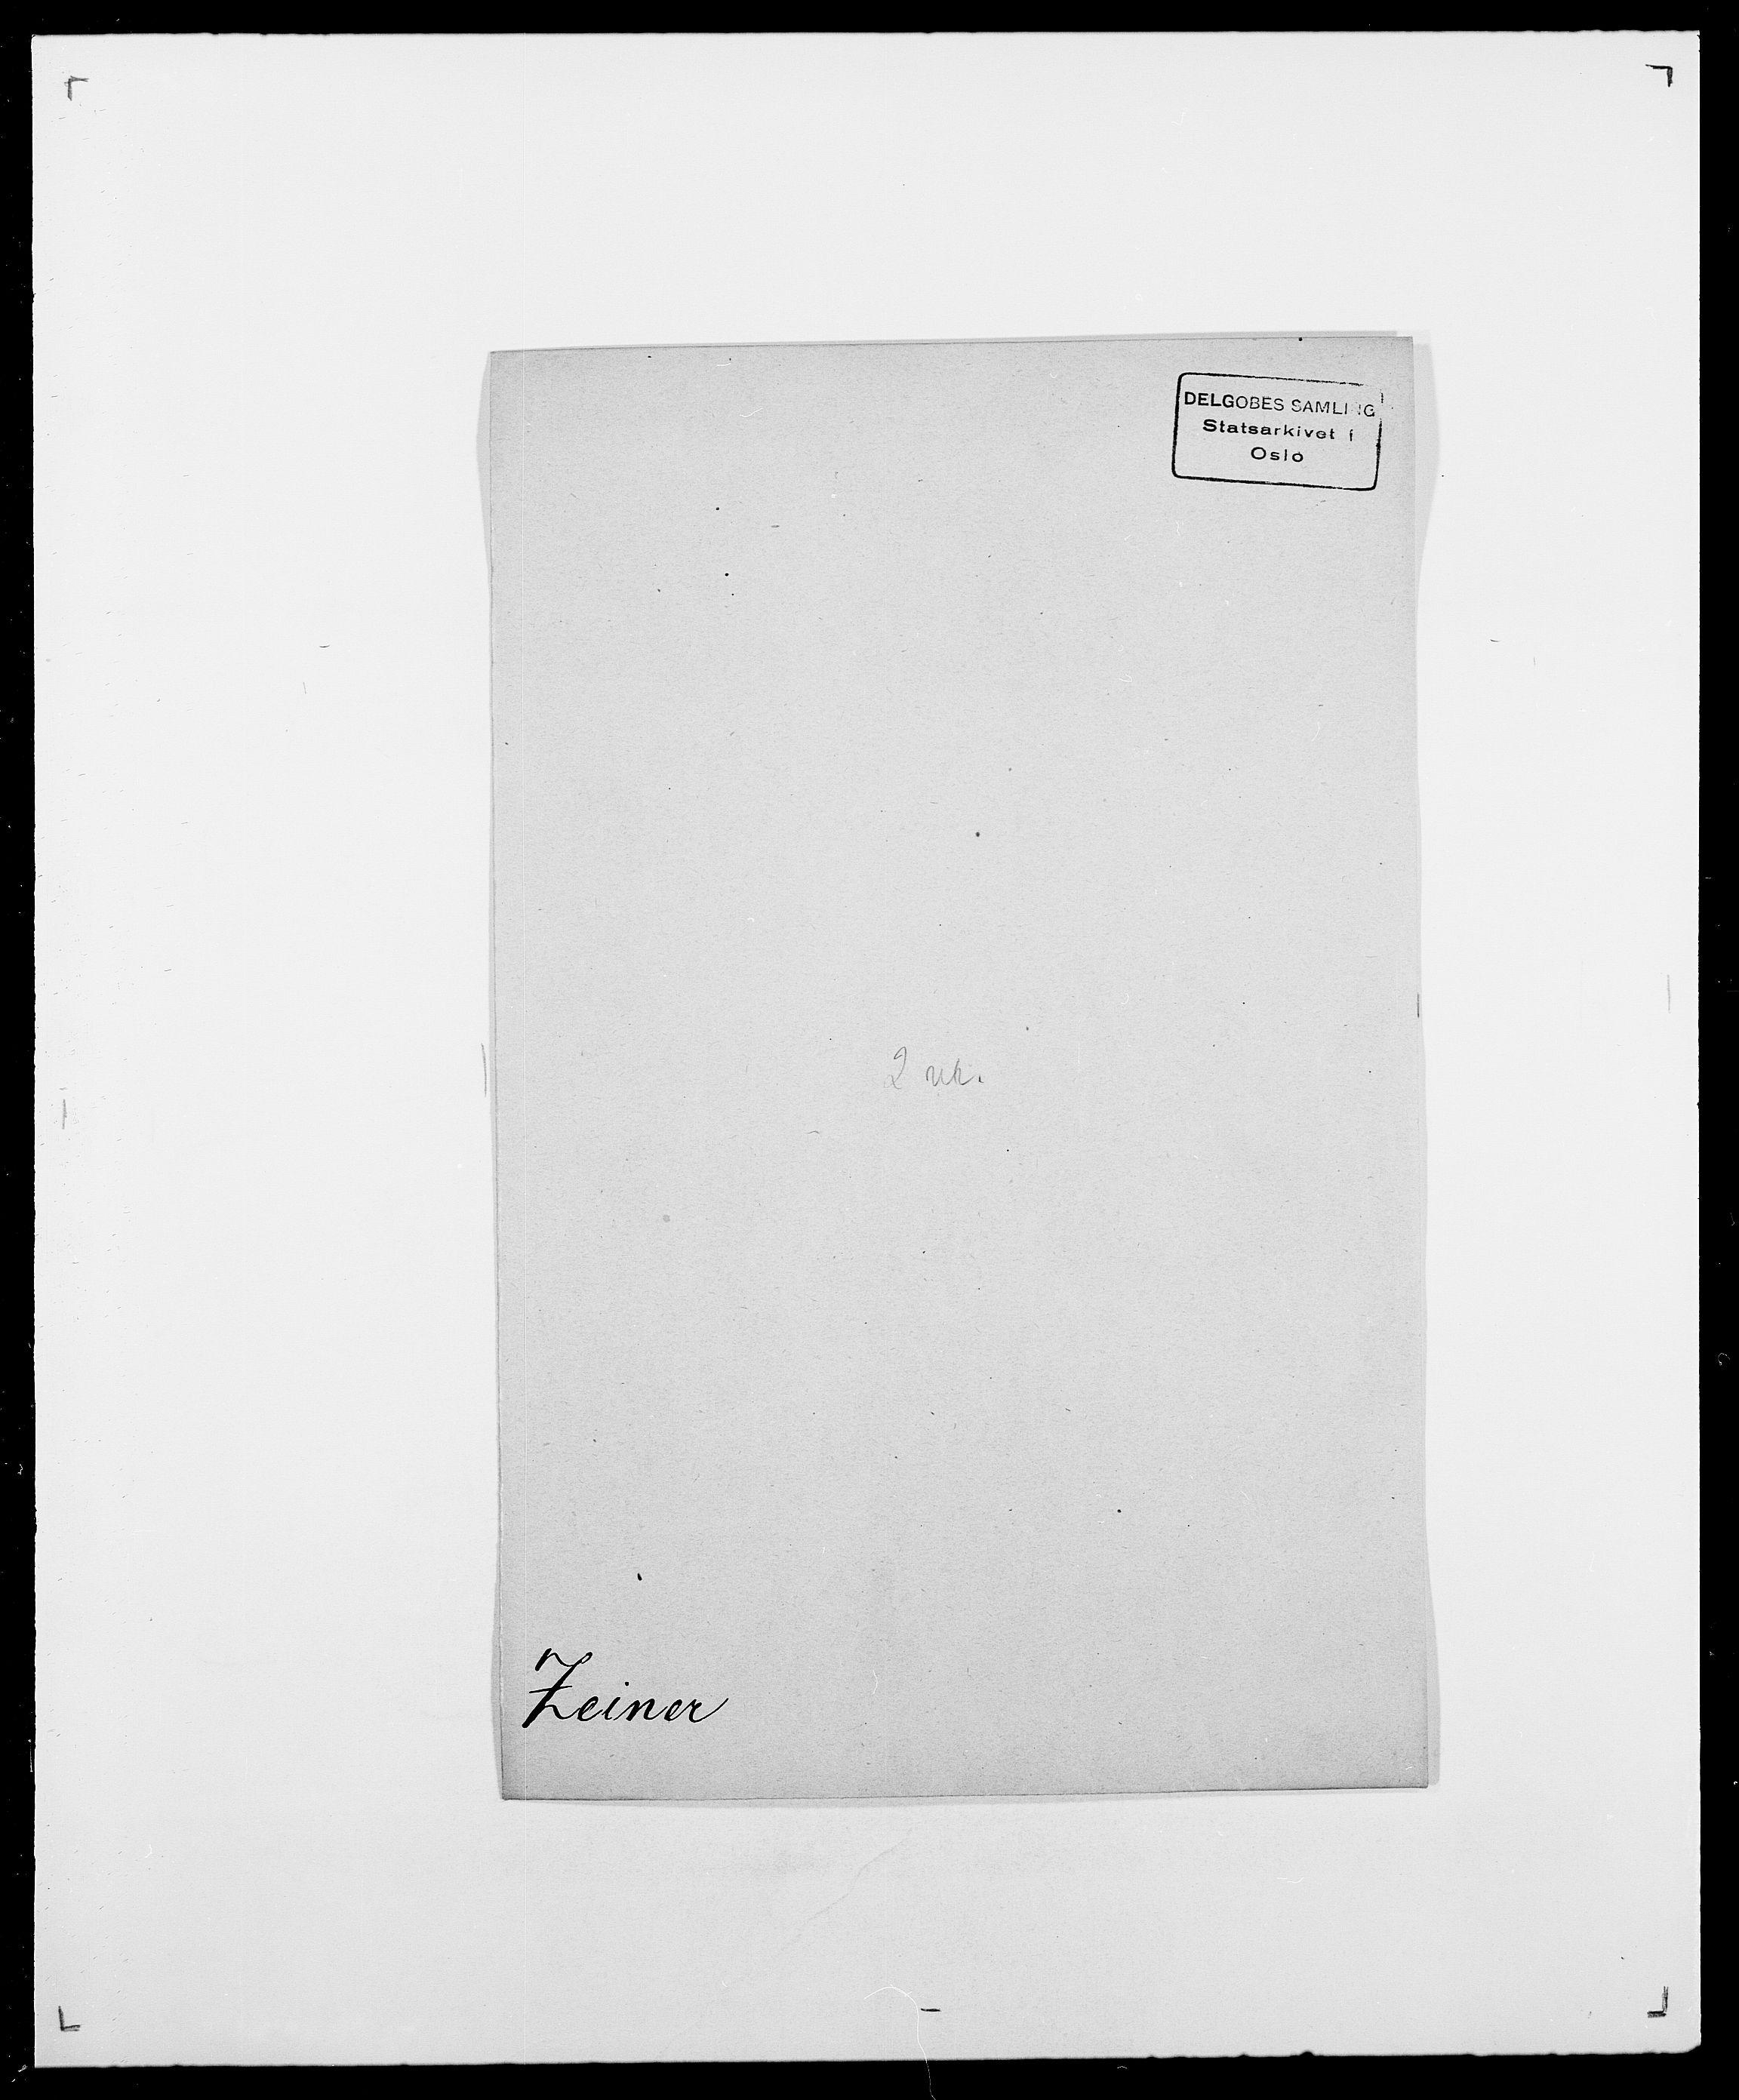 SAO, Delgobe, Charles Antoine - samling, D/Da/L0043: Wulfsberg - v. Zanten, s. 105